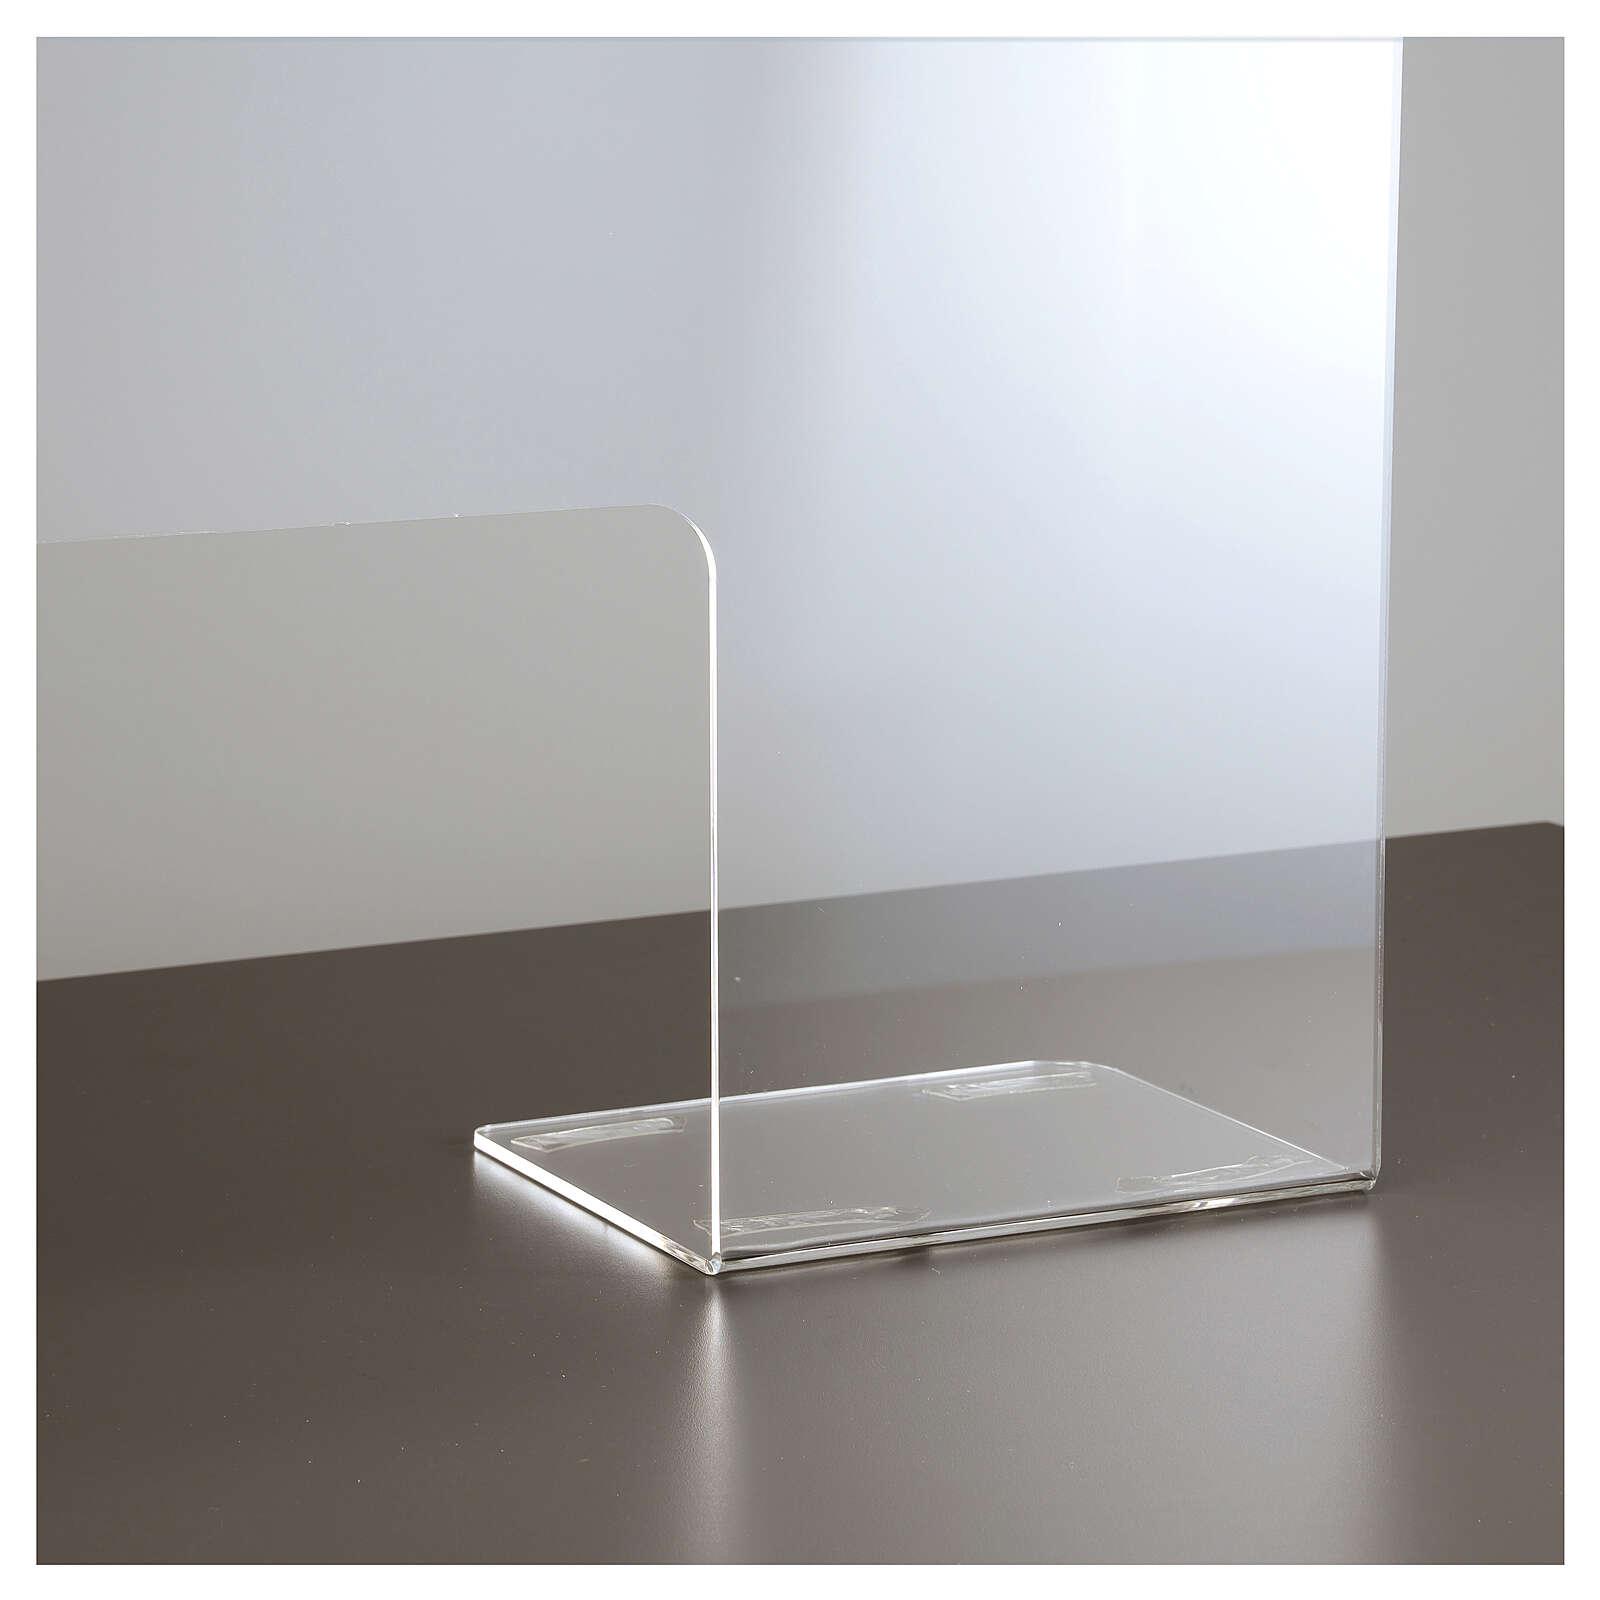 Protective Plexiglass shield 65x100 cm, thickness 8mm 3